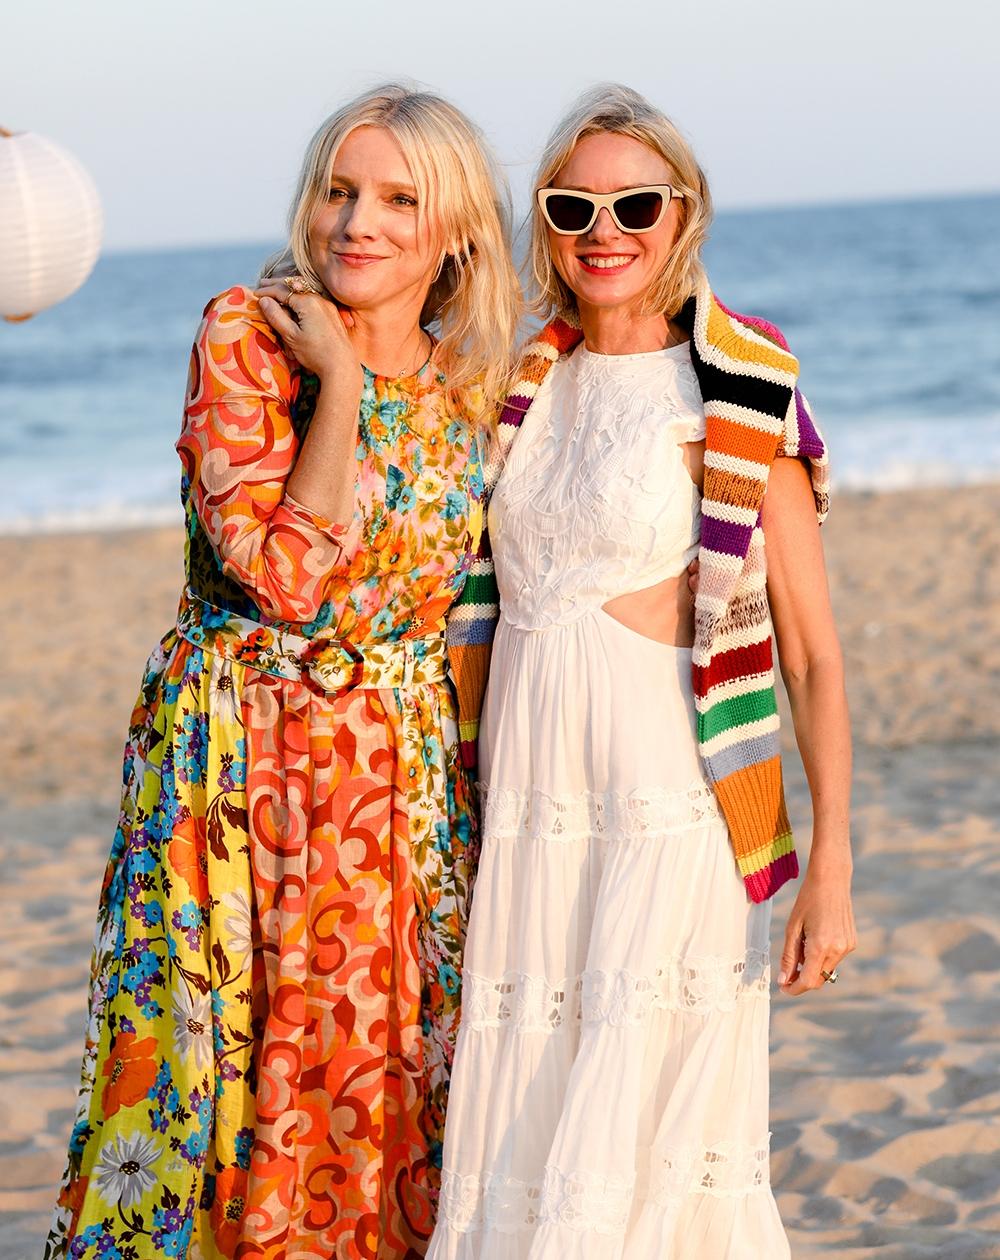 Laura Brown & Naomi Watts on the beach